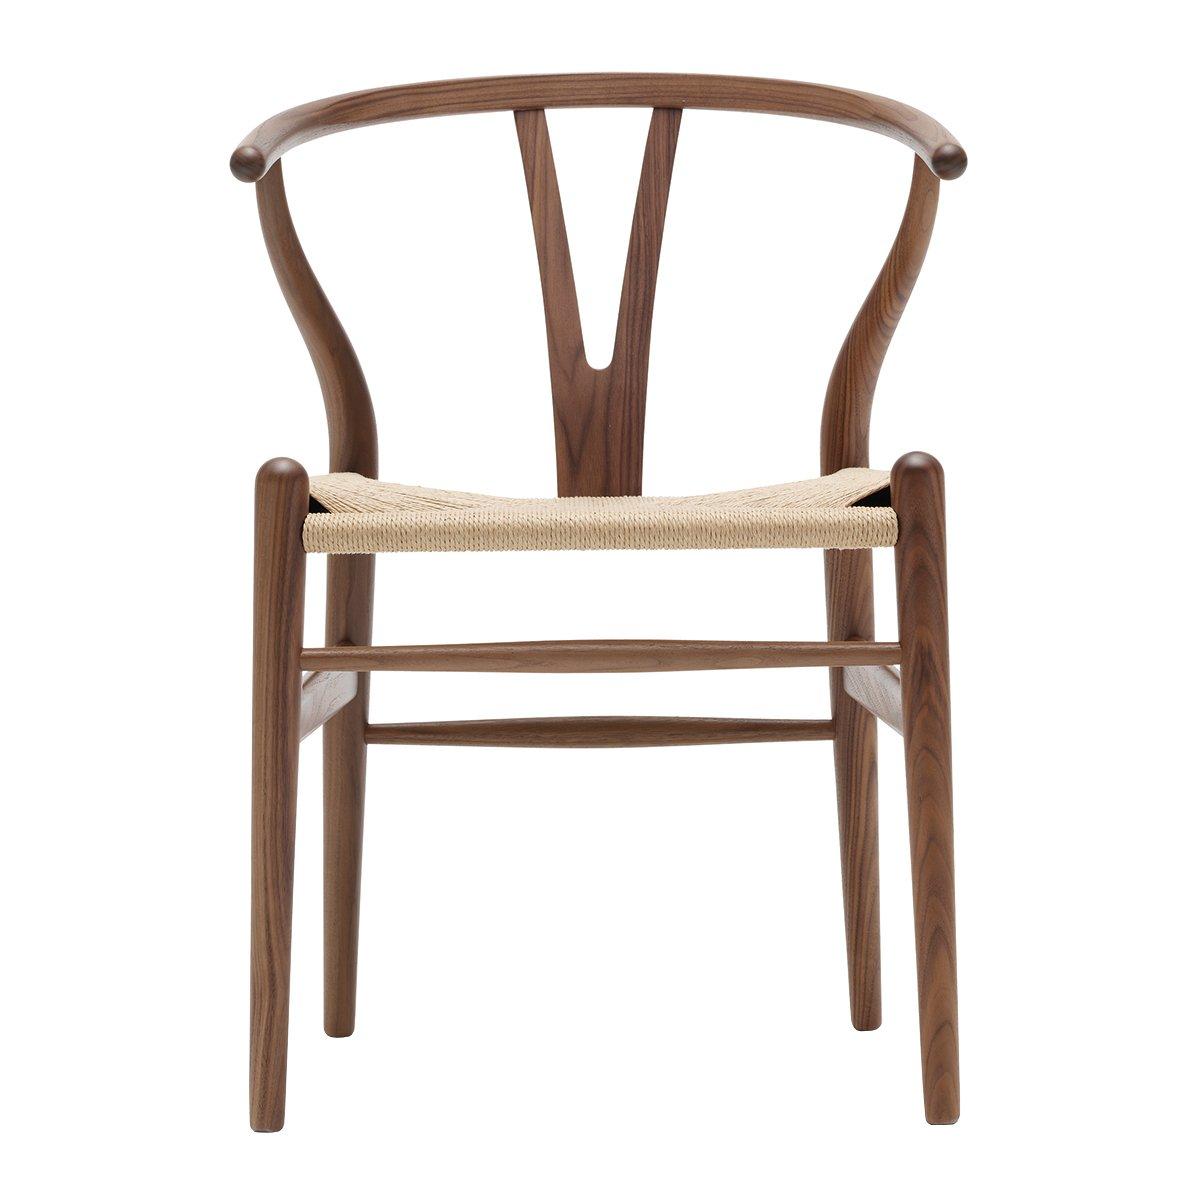 Carl Hansen Wishbone Chair Walnoot Geolied - Naturel